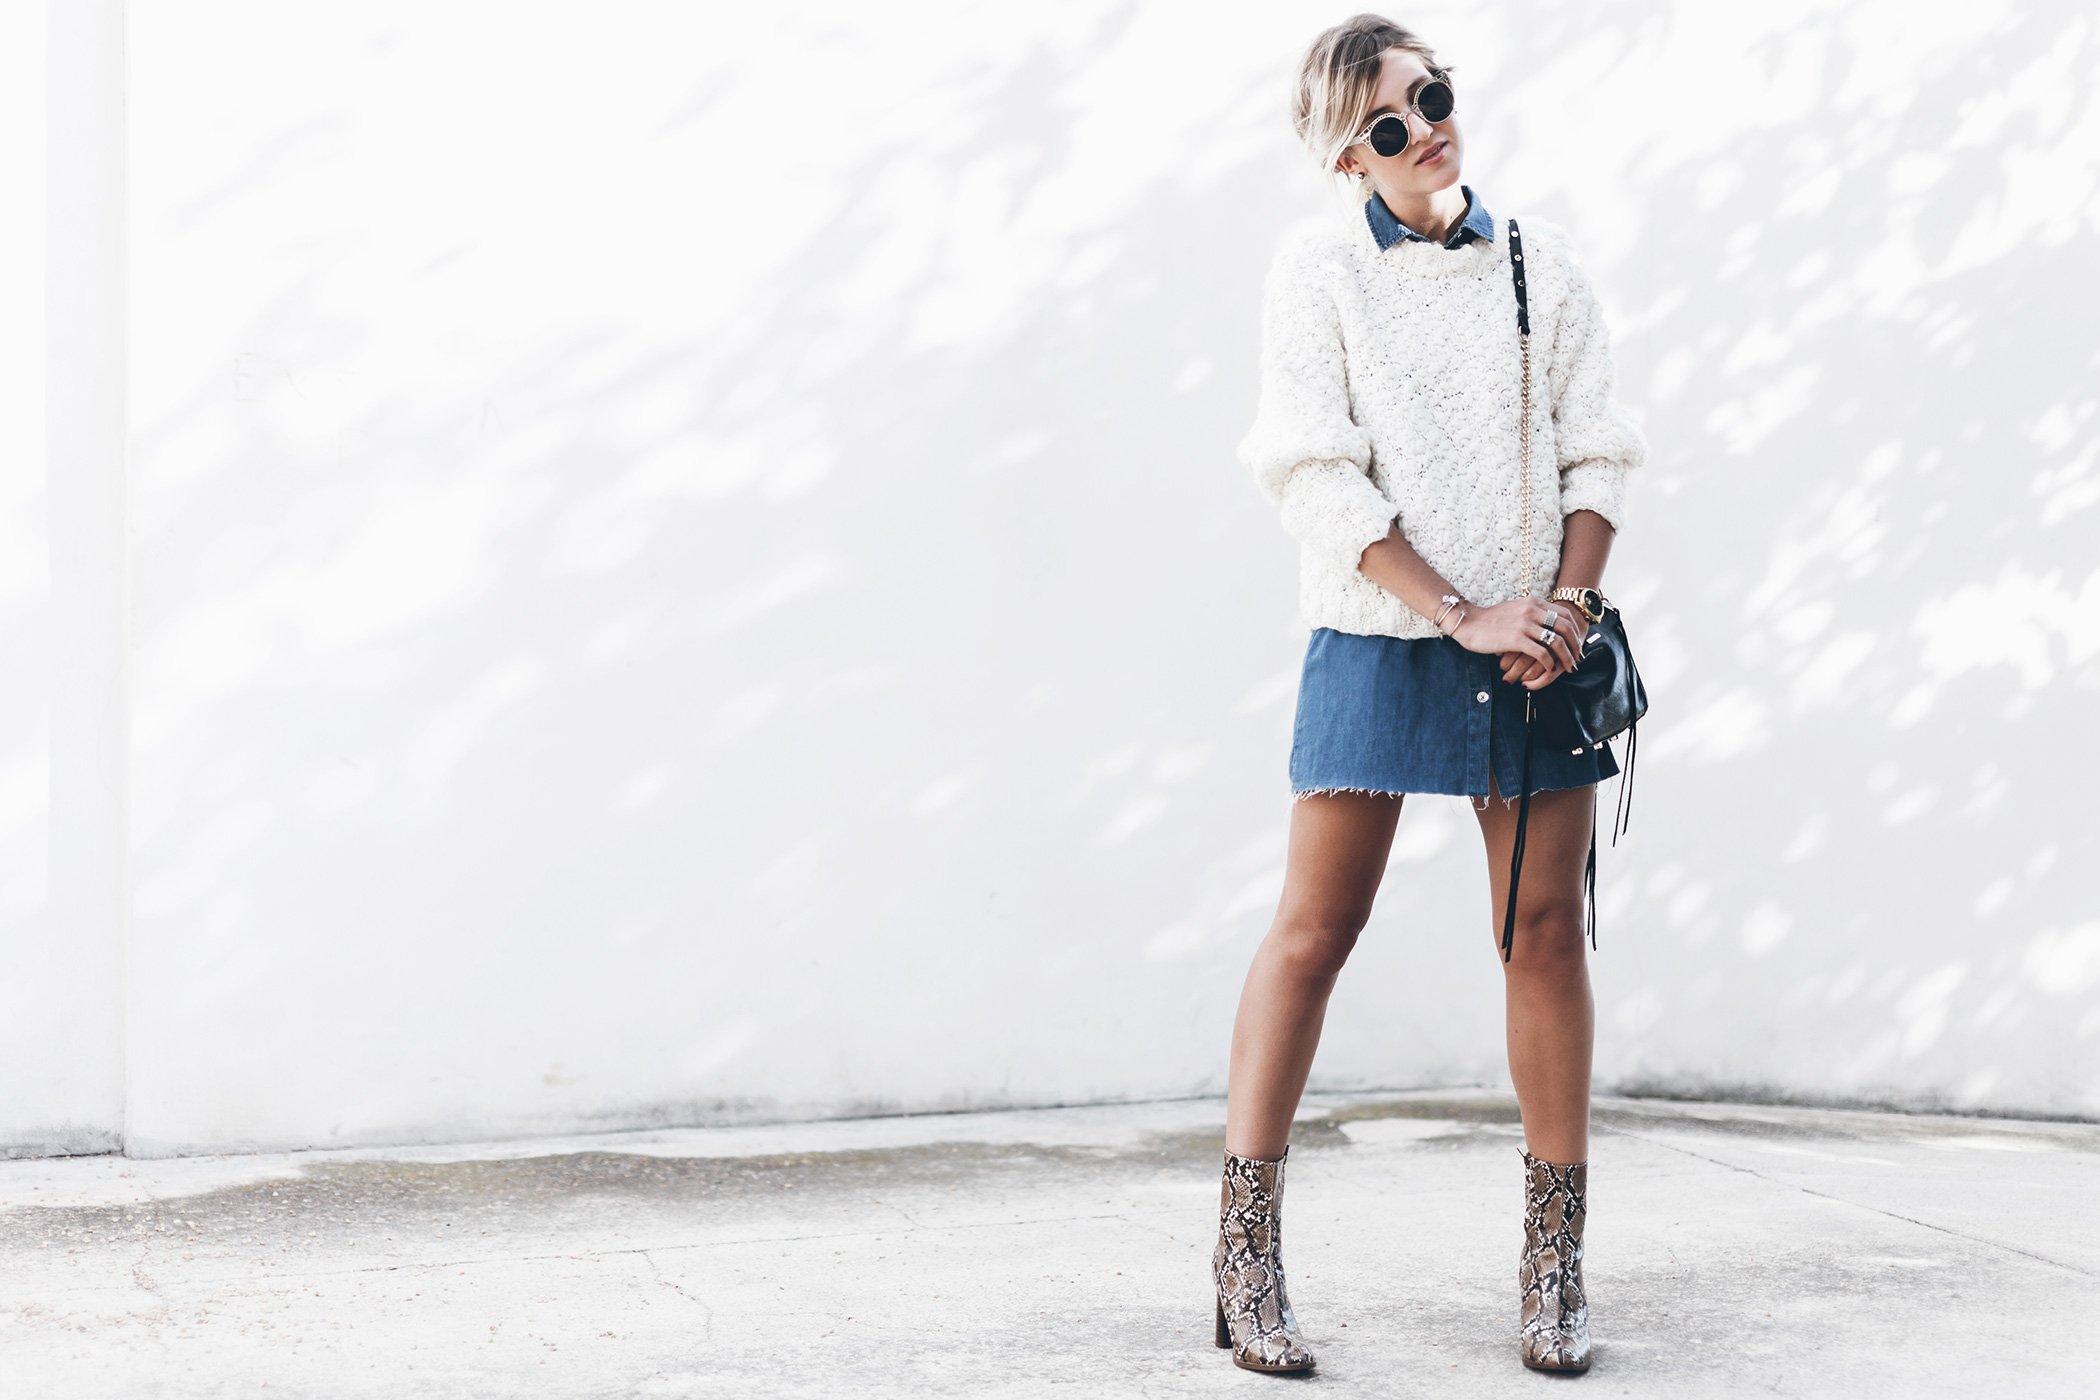 mikuta-snake-boots-and-denim-skirt-1